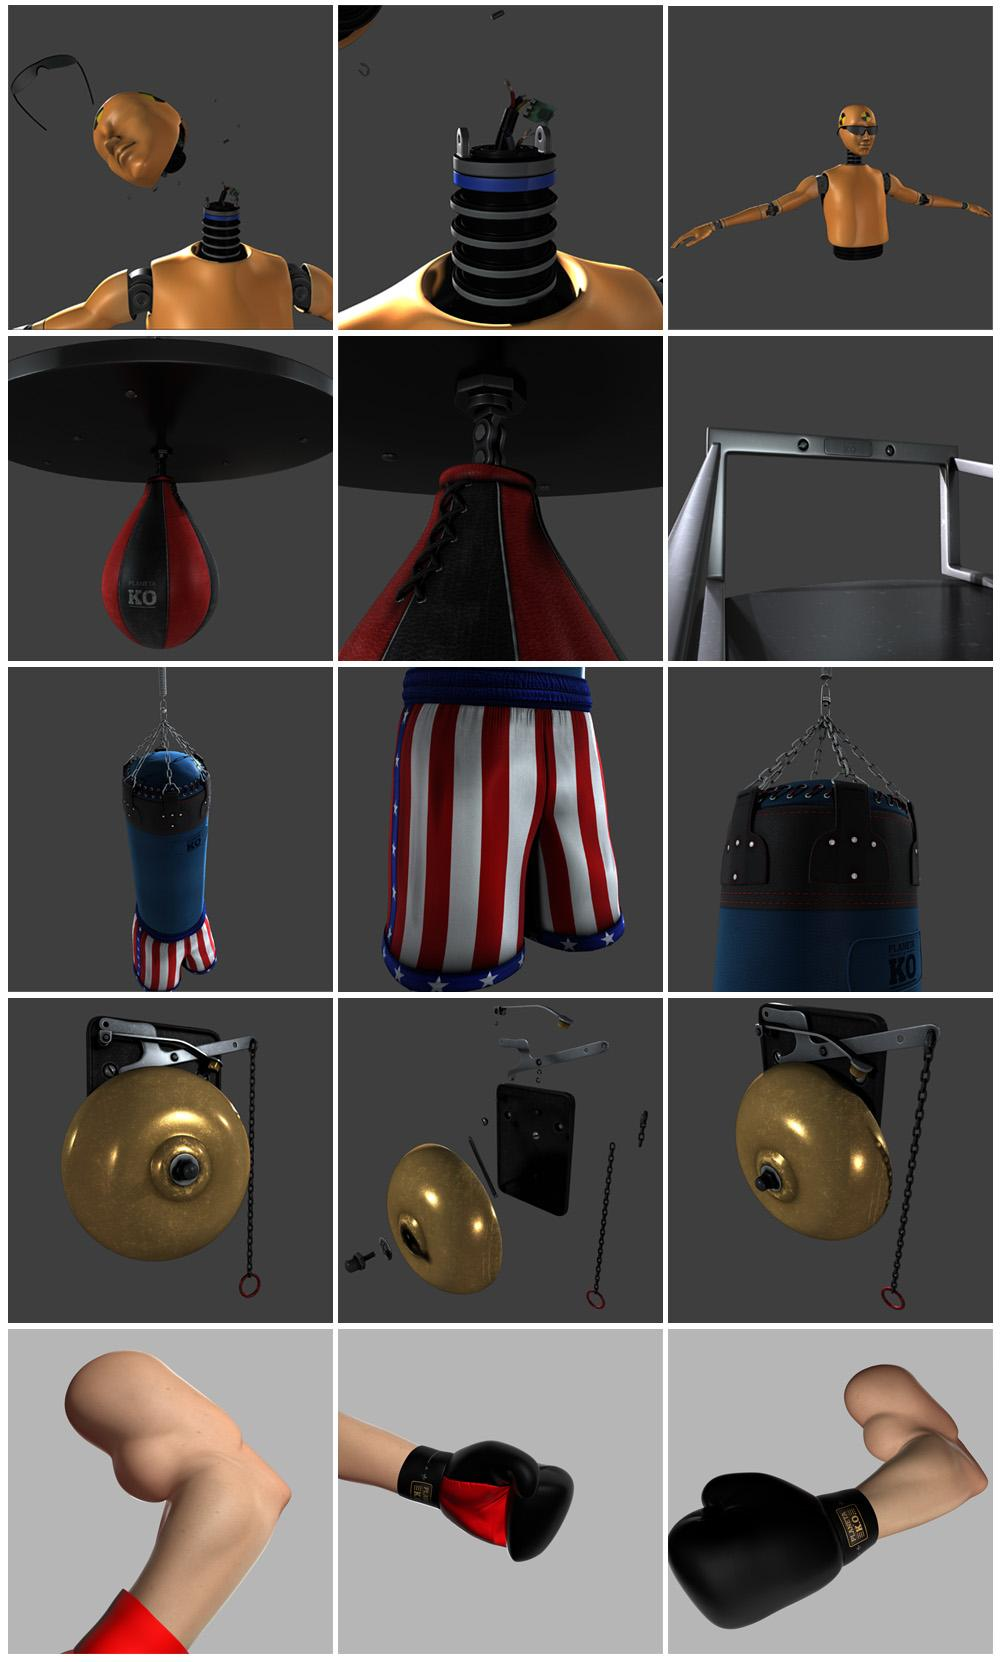 3Ds - PlanetaKO - TyCSports - CampMeiaStudio